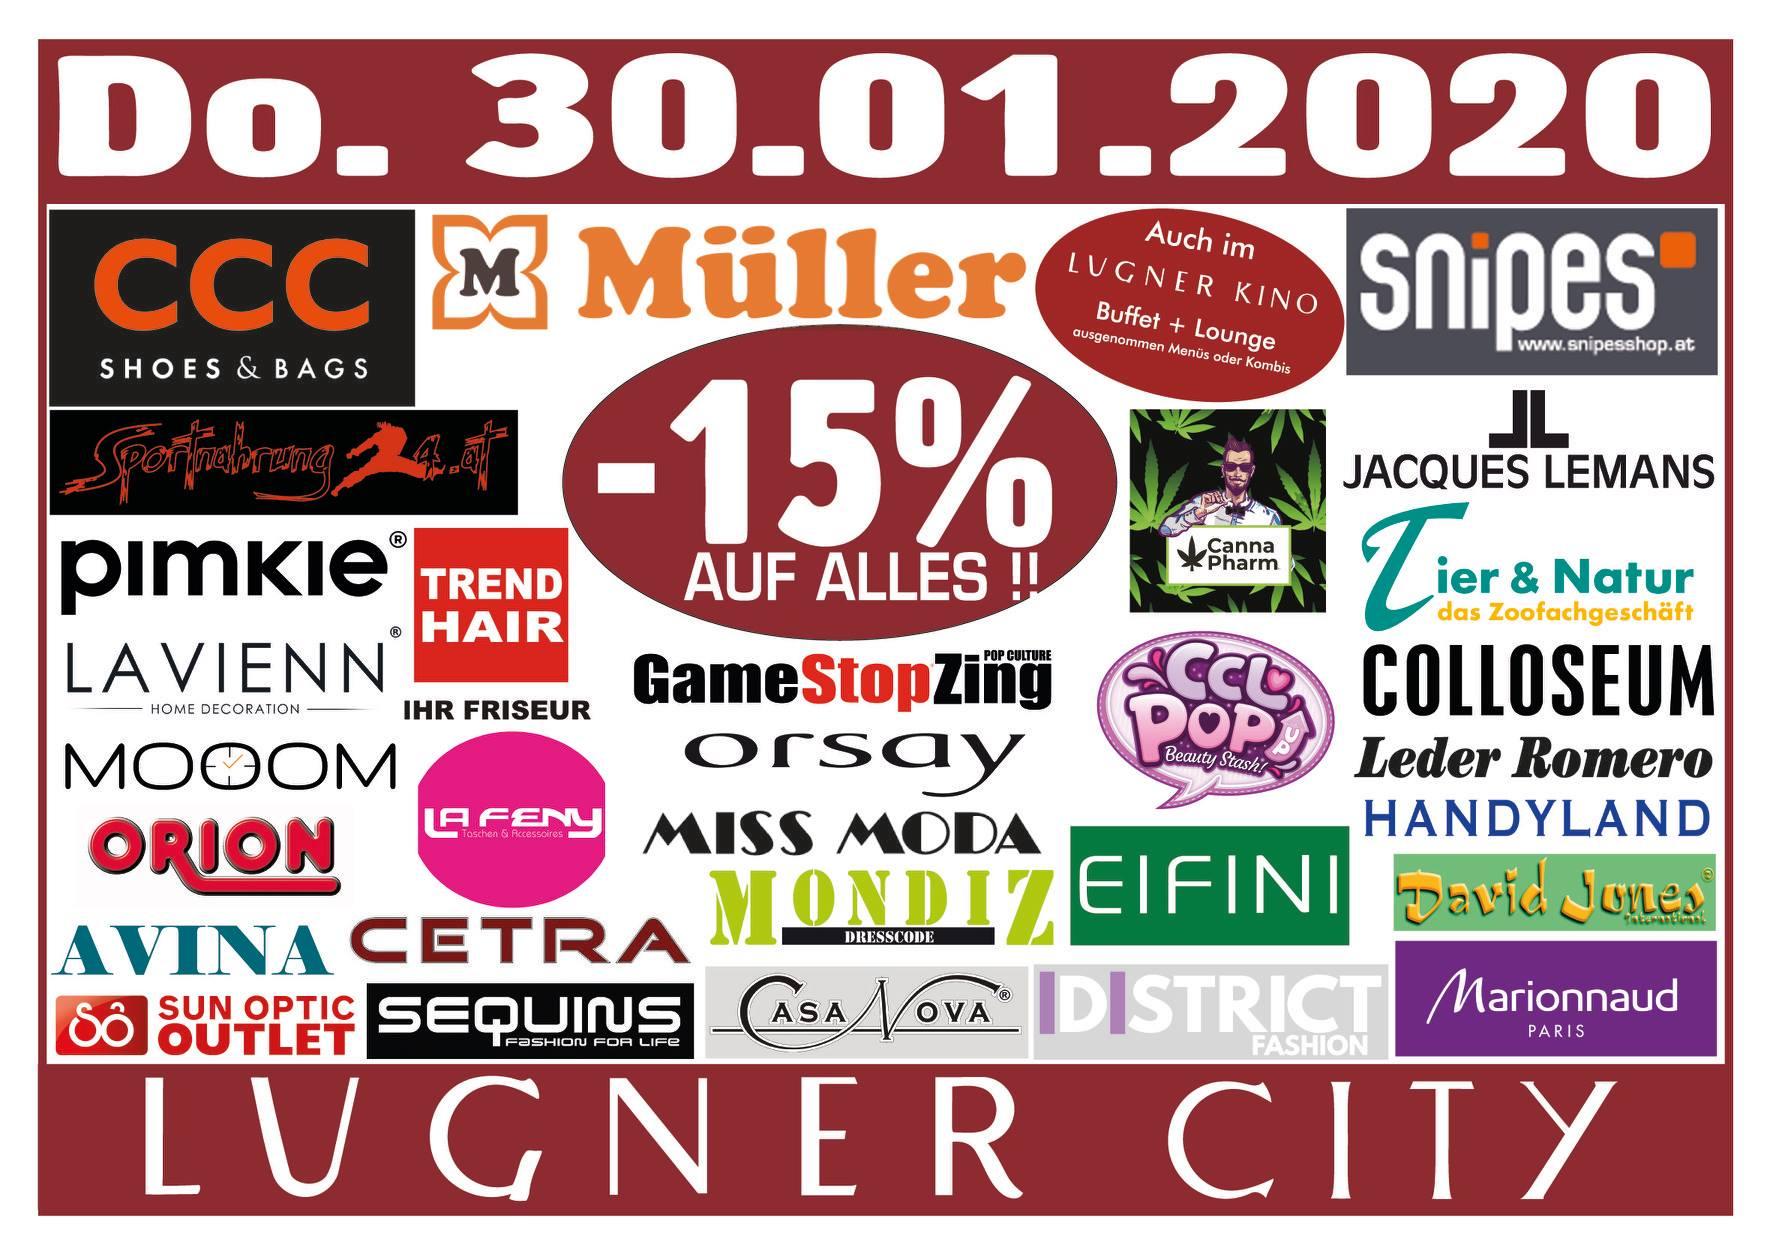 Lugner City -15% in 34 Shops